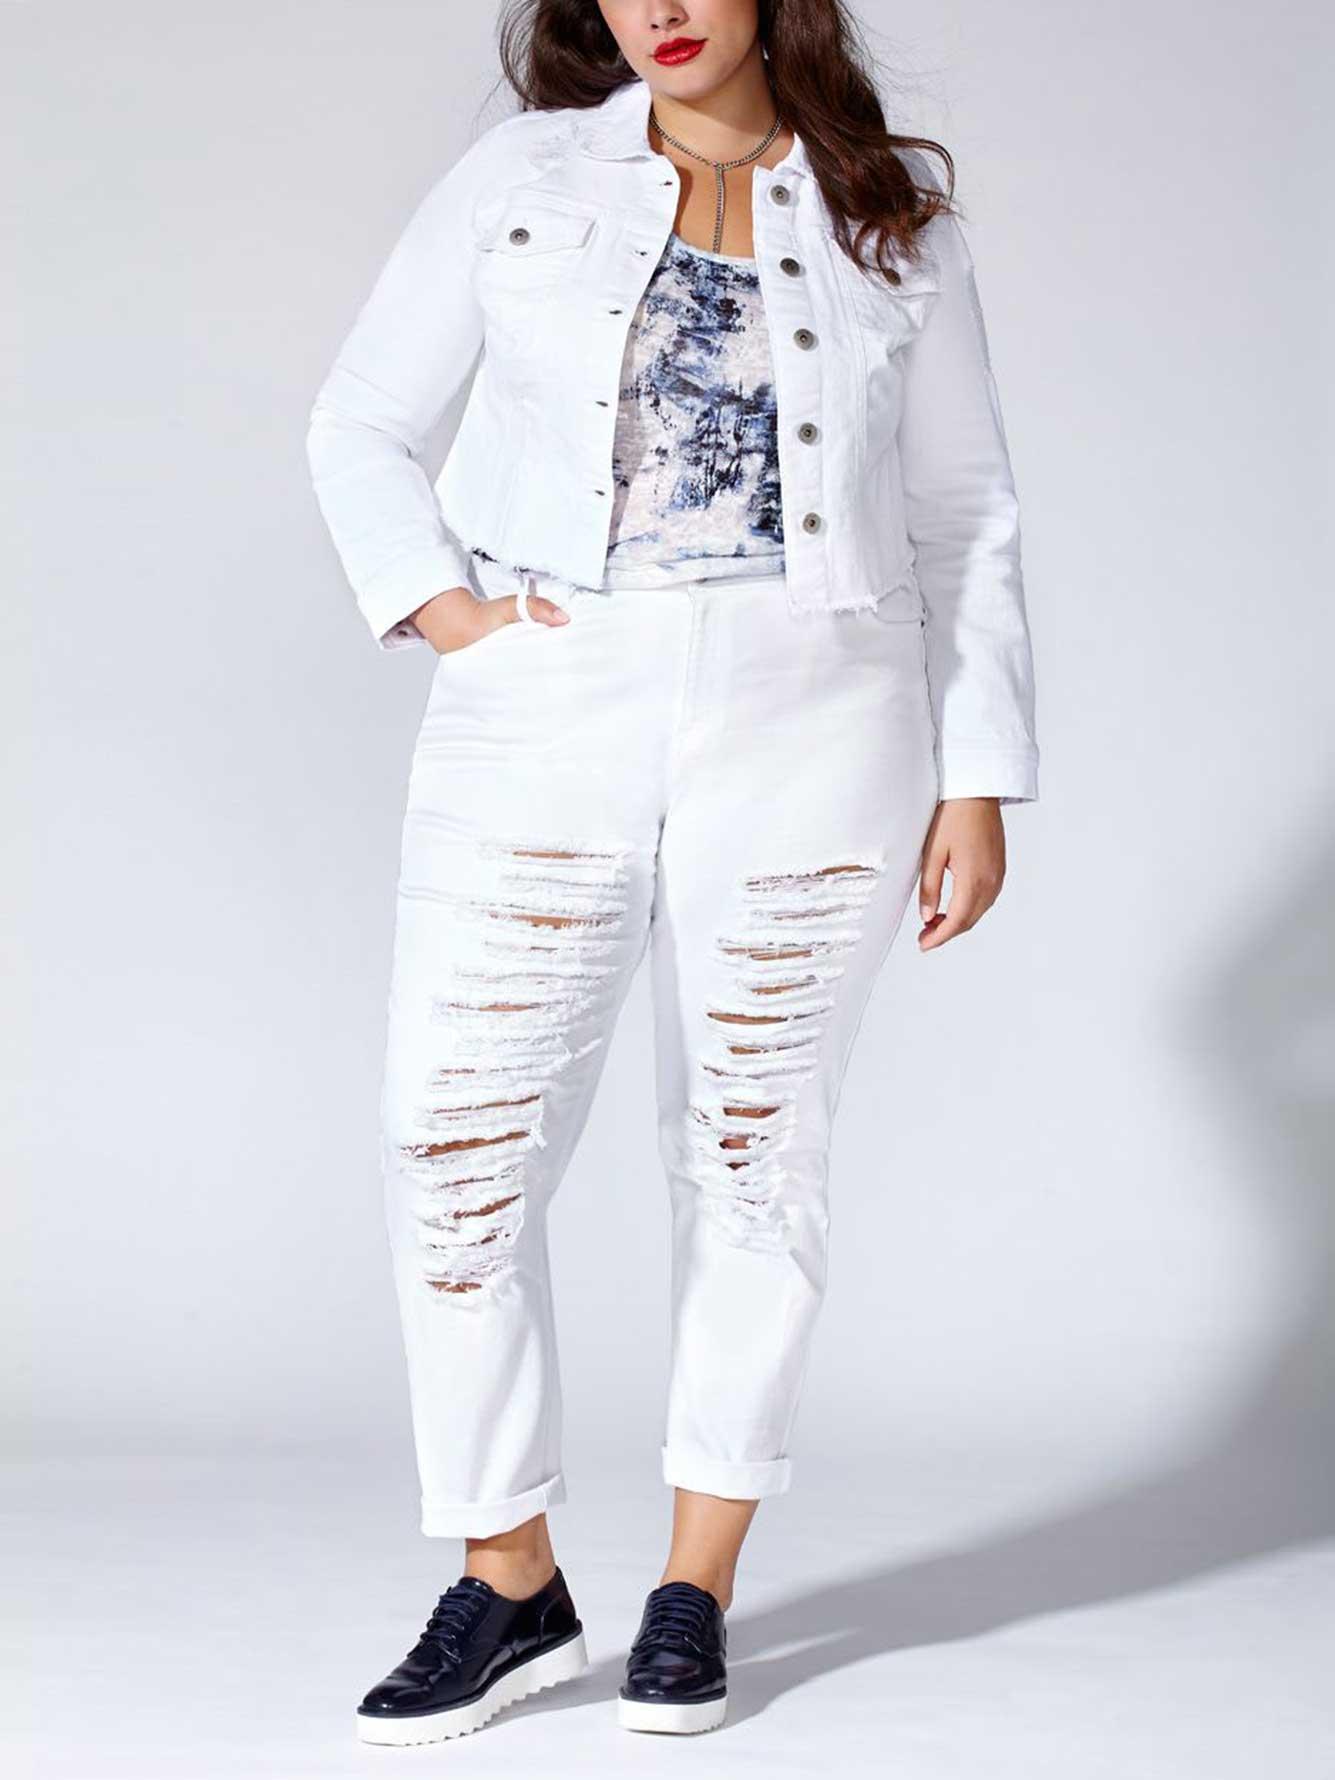 d1c860765f0 Tess Holliday - Cropped White Denim Jacket